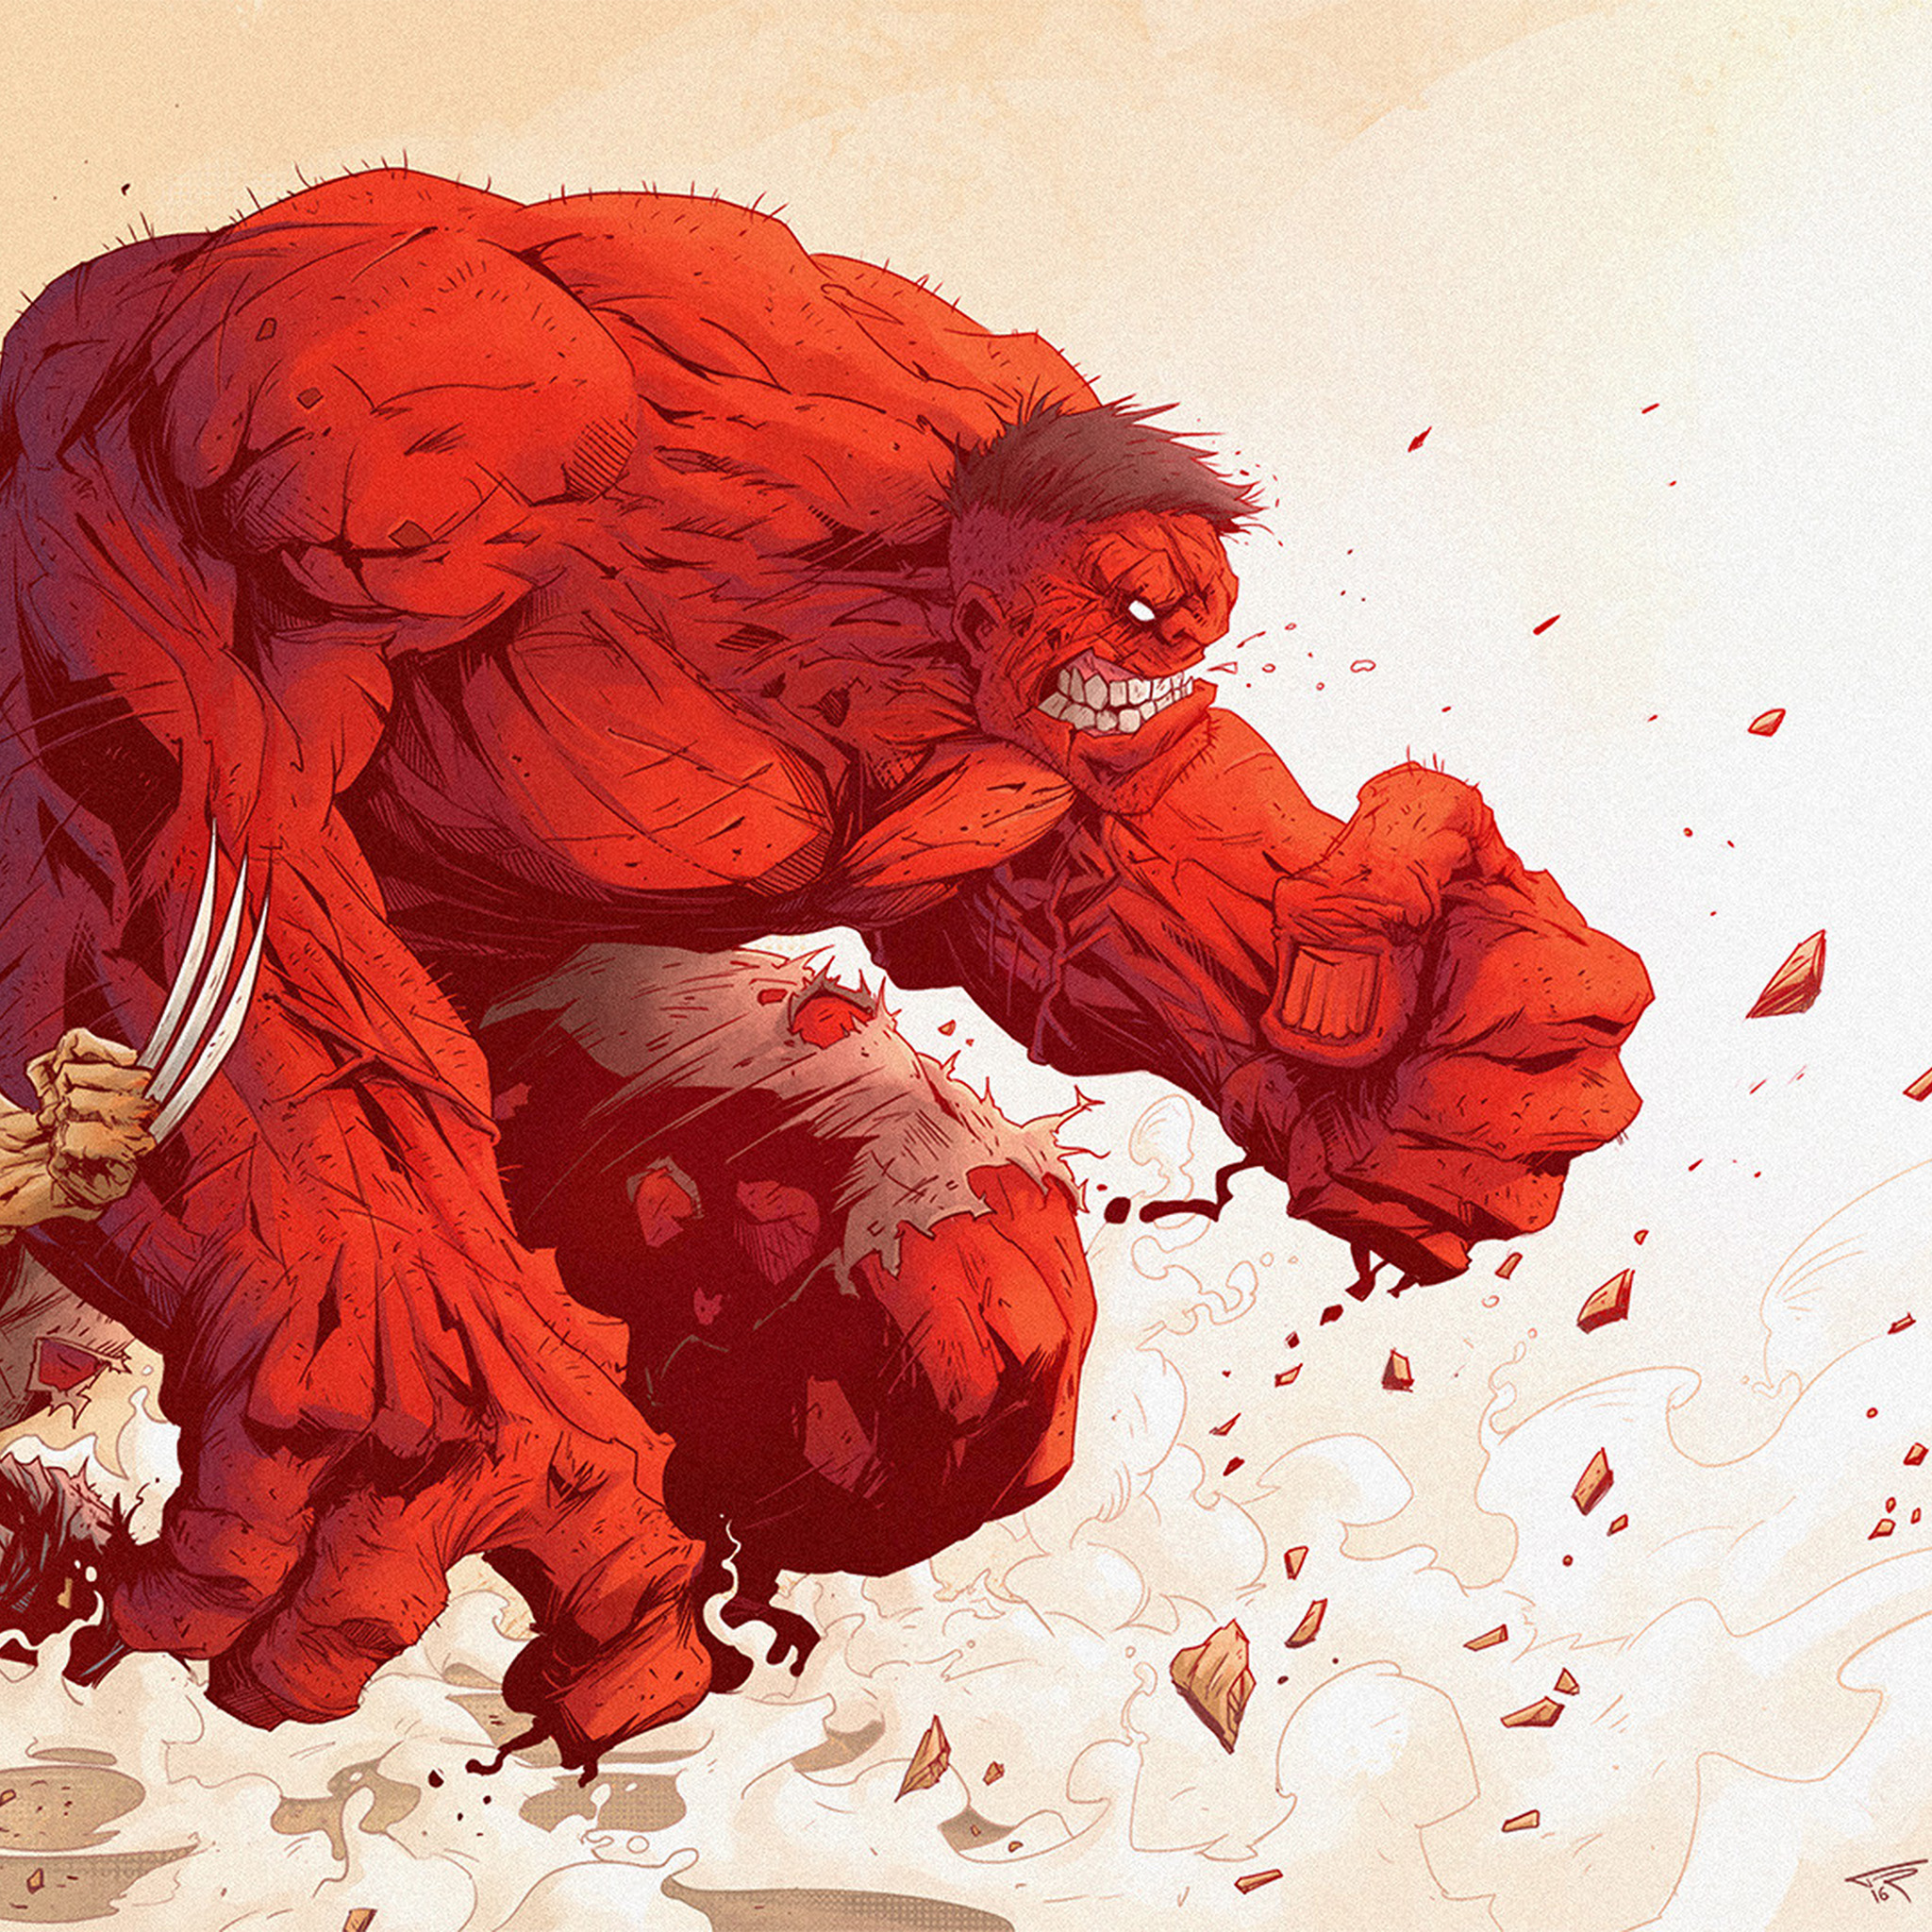 Art Illustration: Aw95-hulk-anime-tonton-revolver-illustration-art-red-hero